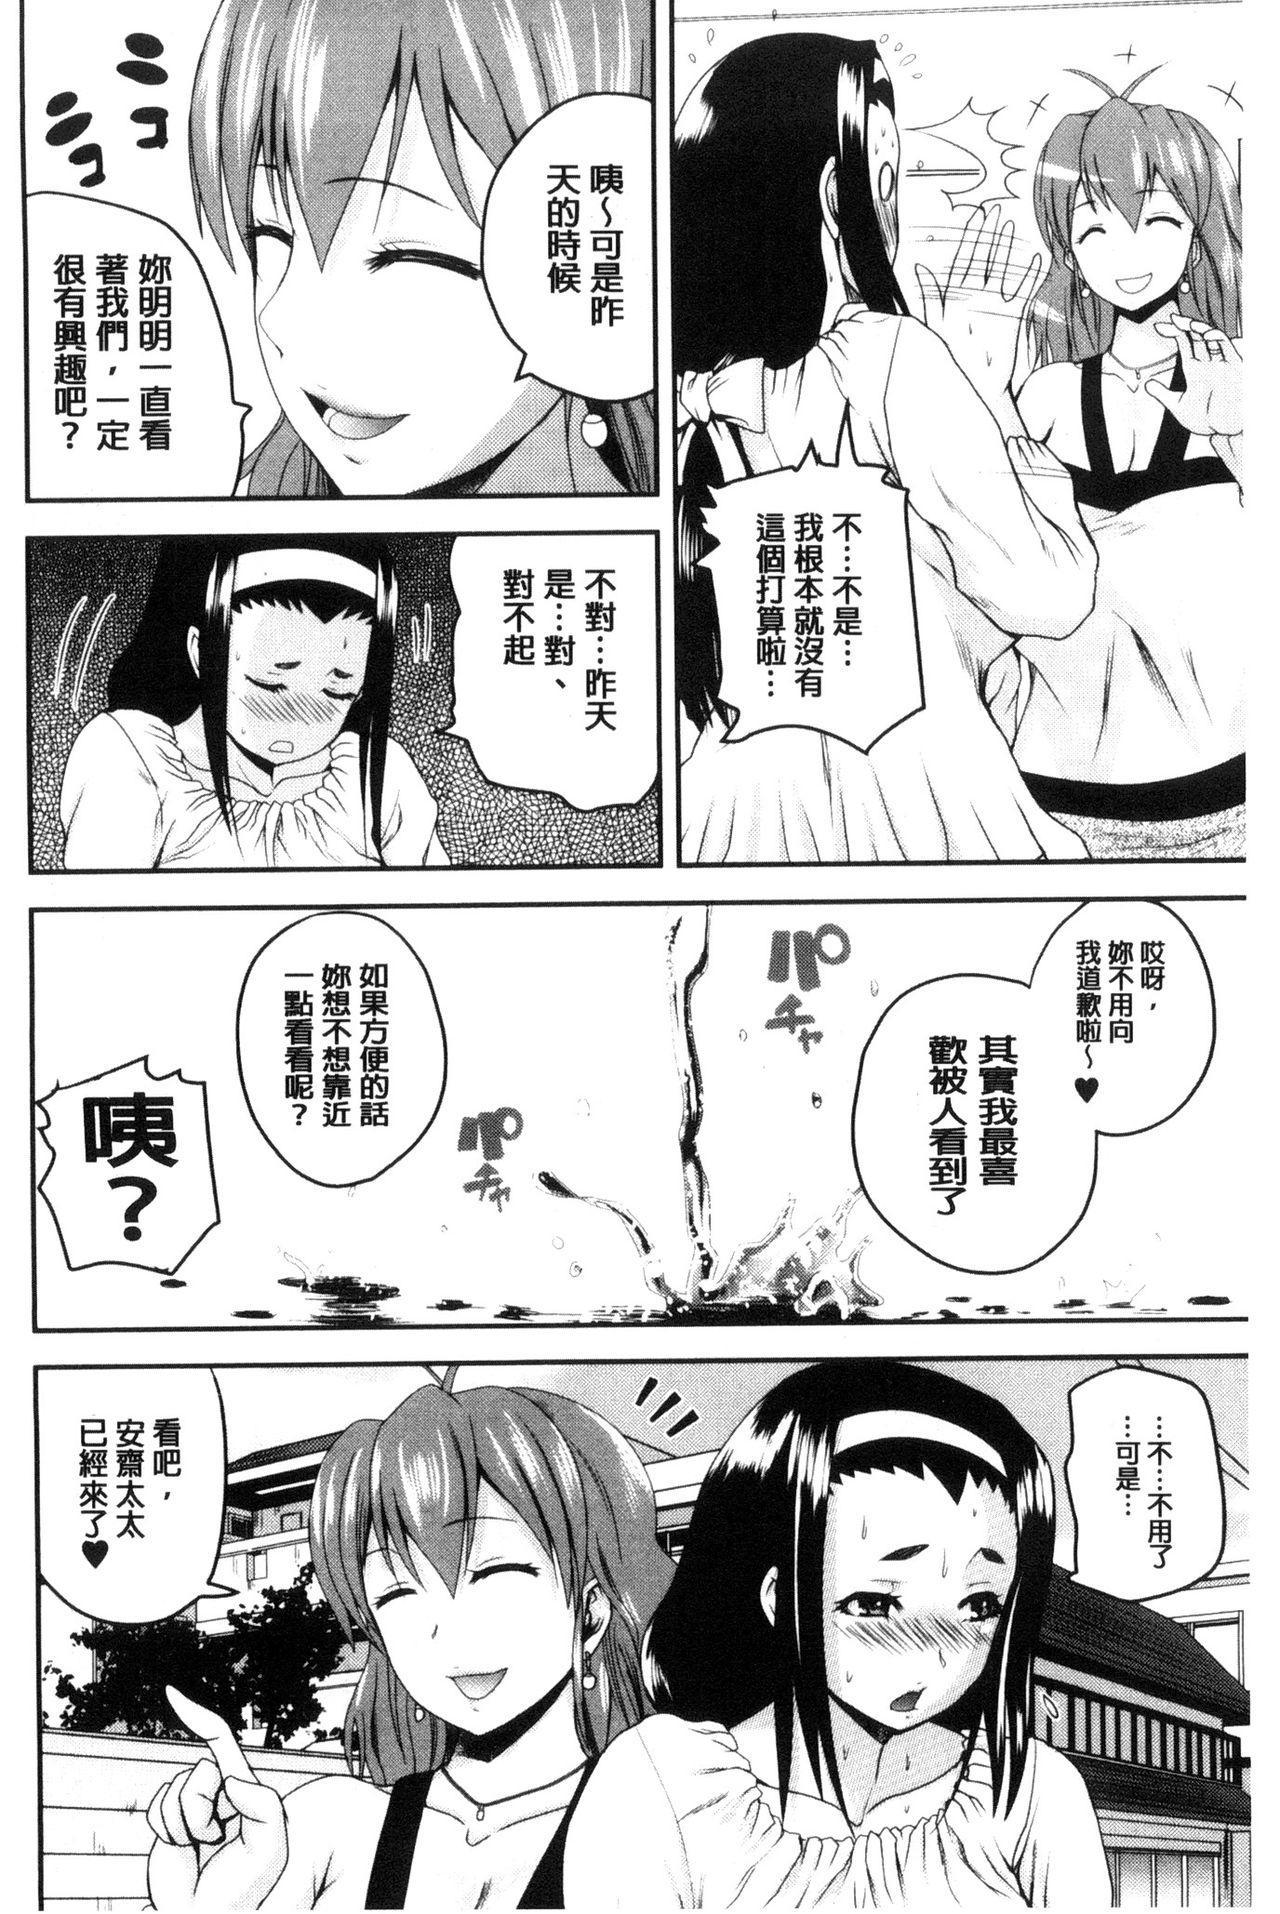 Opink Health Seibo no Fukuin 142